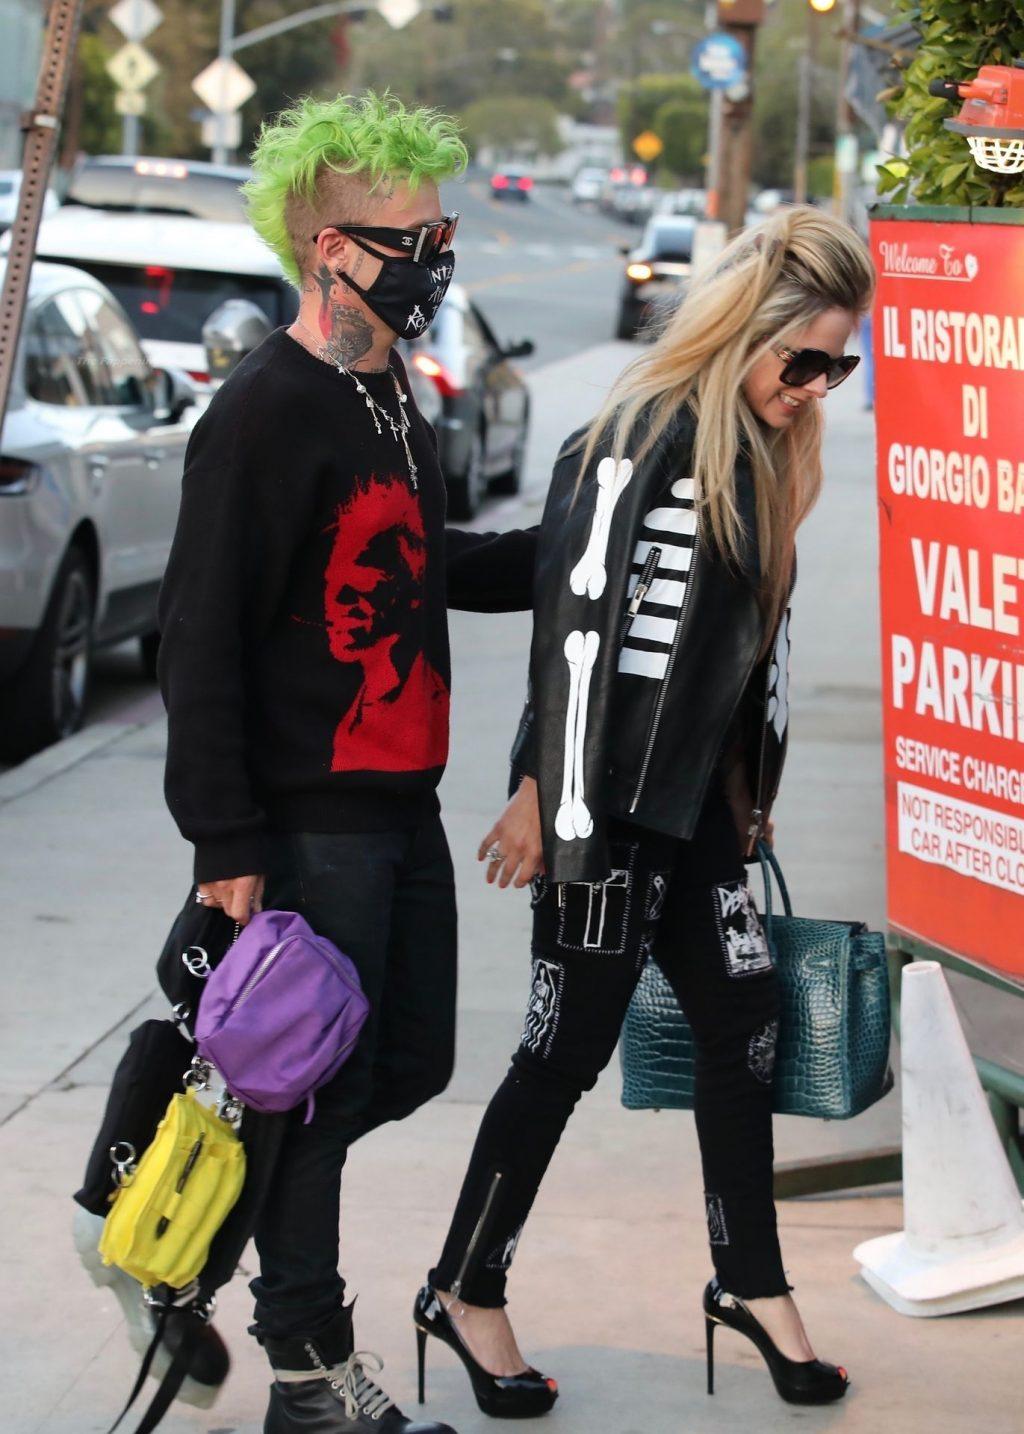 Avril Lavigne & Mod Sun Arrive for Dinner at Giorgio Baldi (60 Photos)